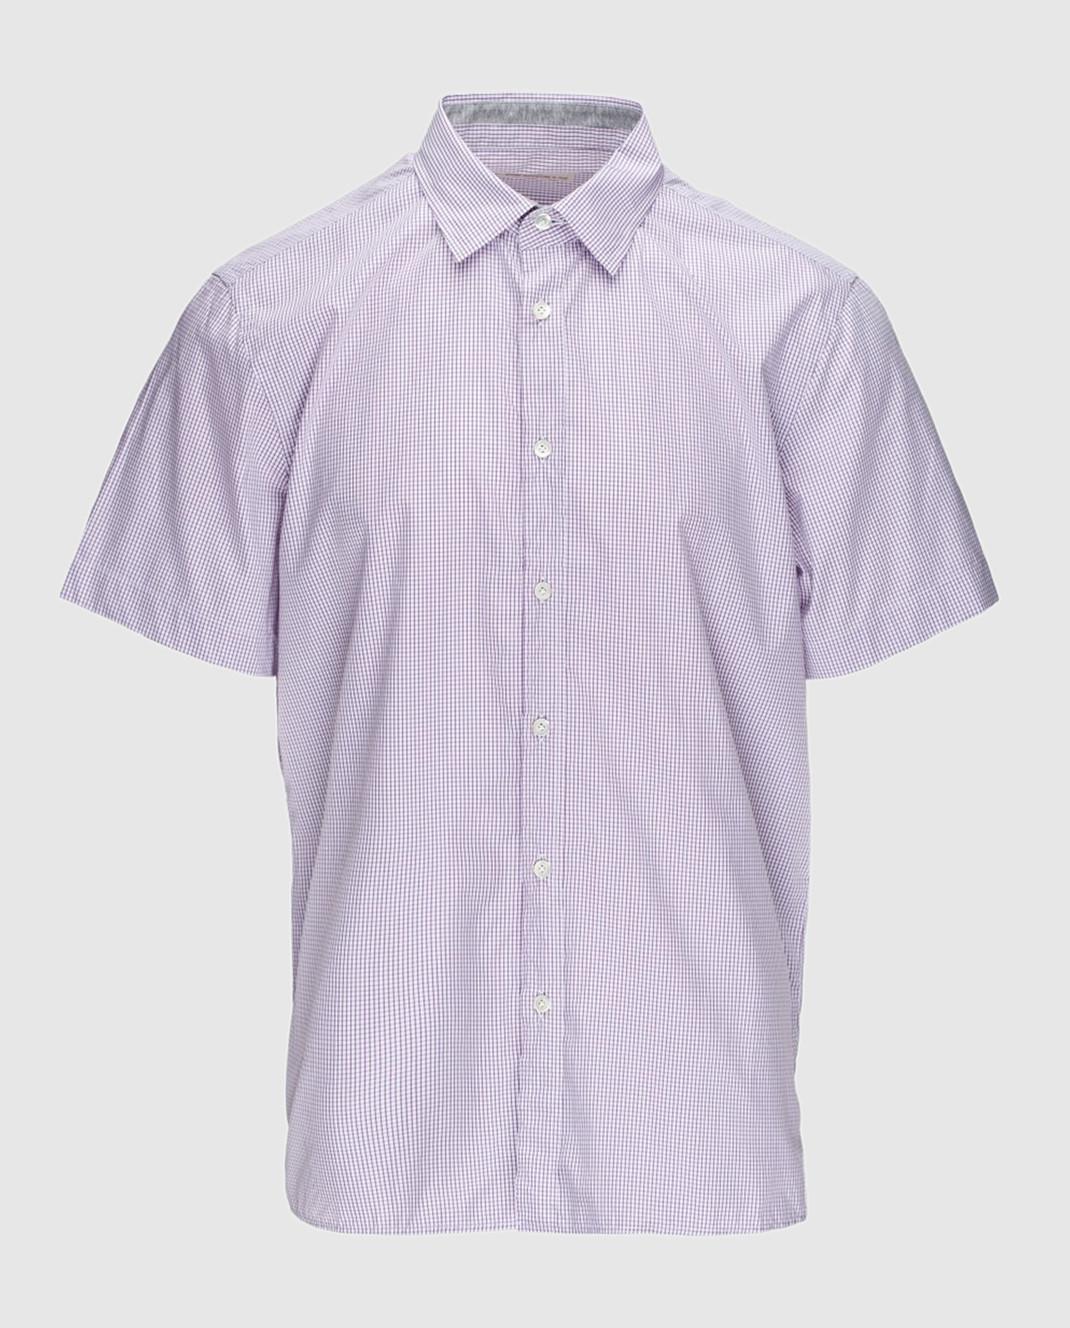 Luciano Barbera Сиреневая рубашка R10559071230